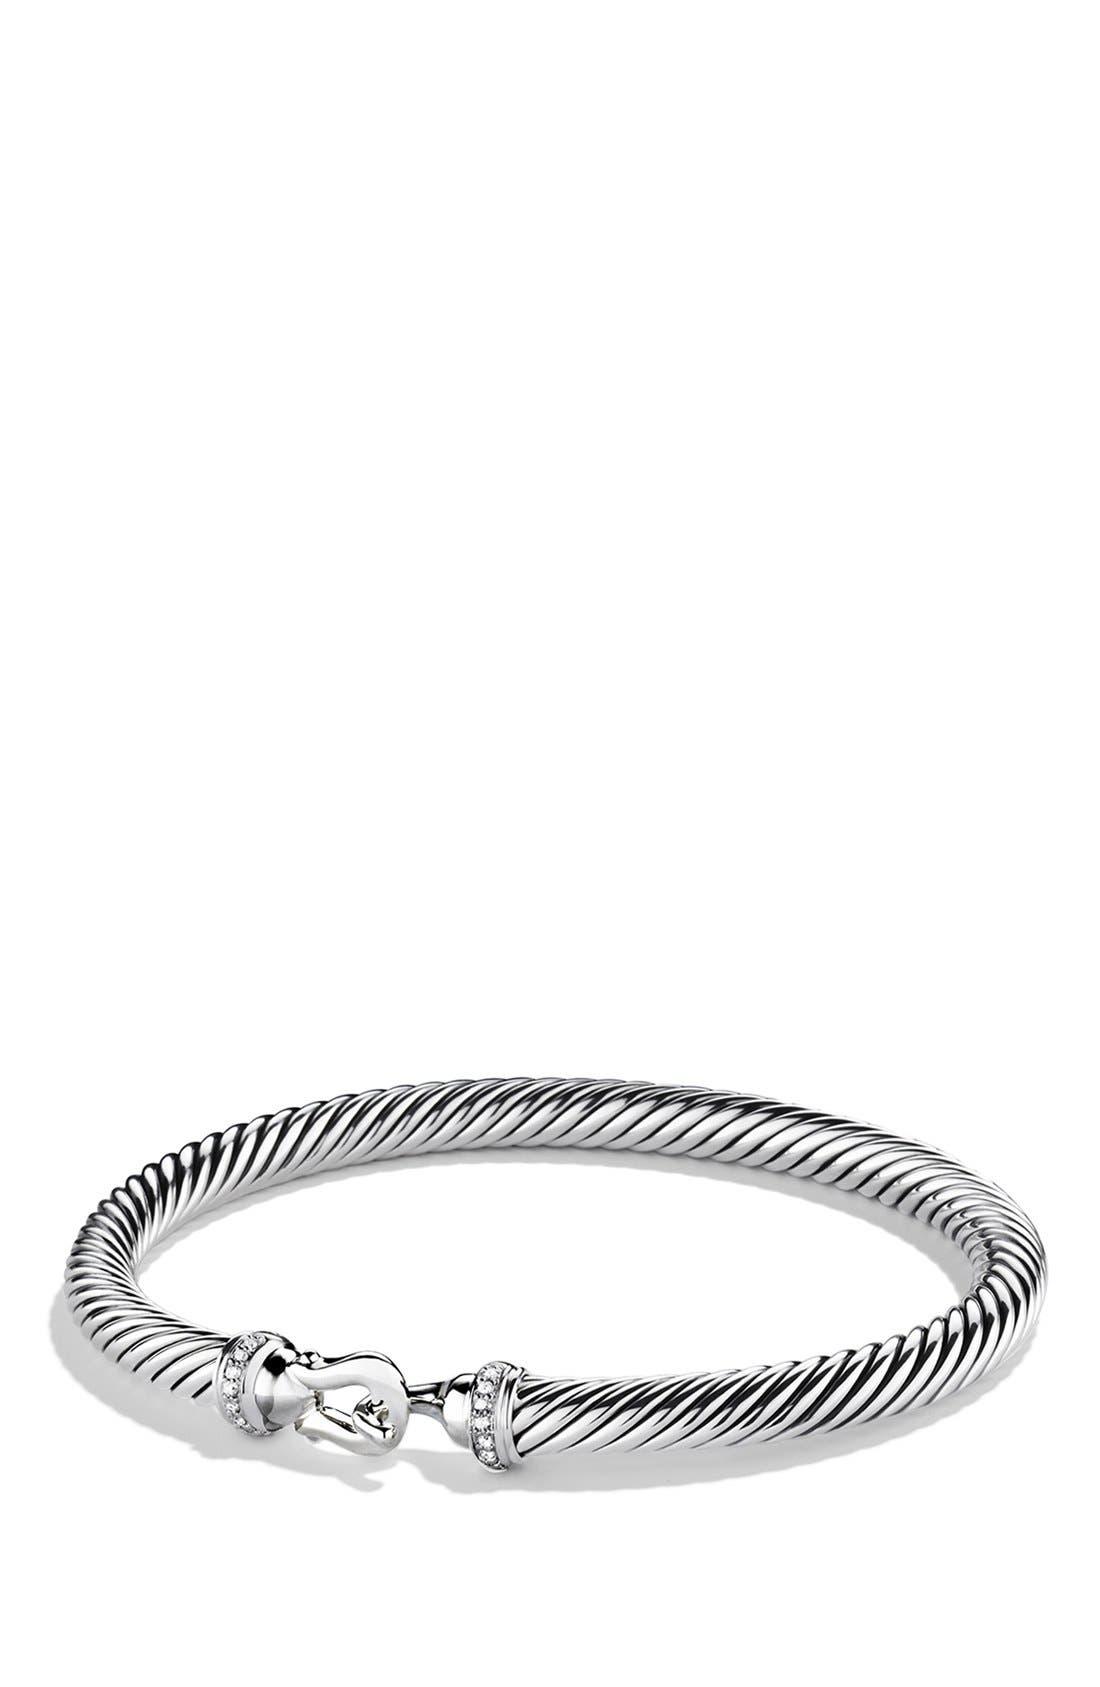 DAVID YURMAN, Cable Buckle Bracelet with Diamonds, 5mm, Main thumbnail 1, color, DIAMOND